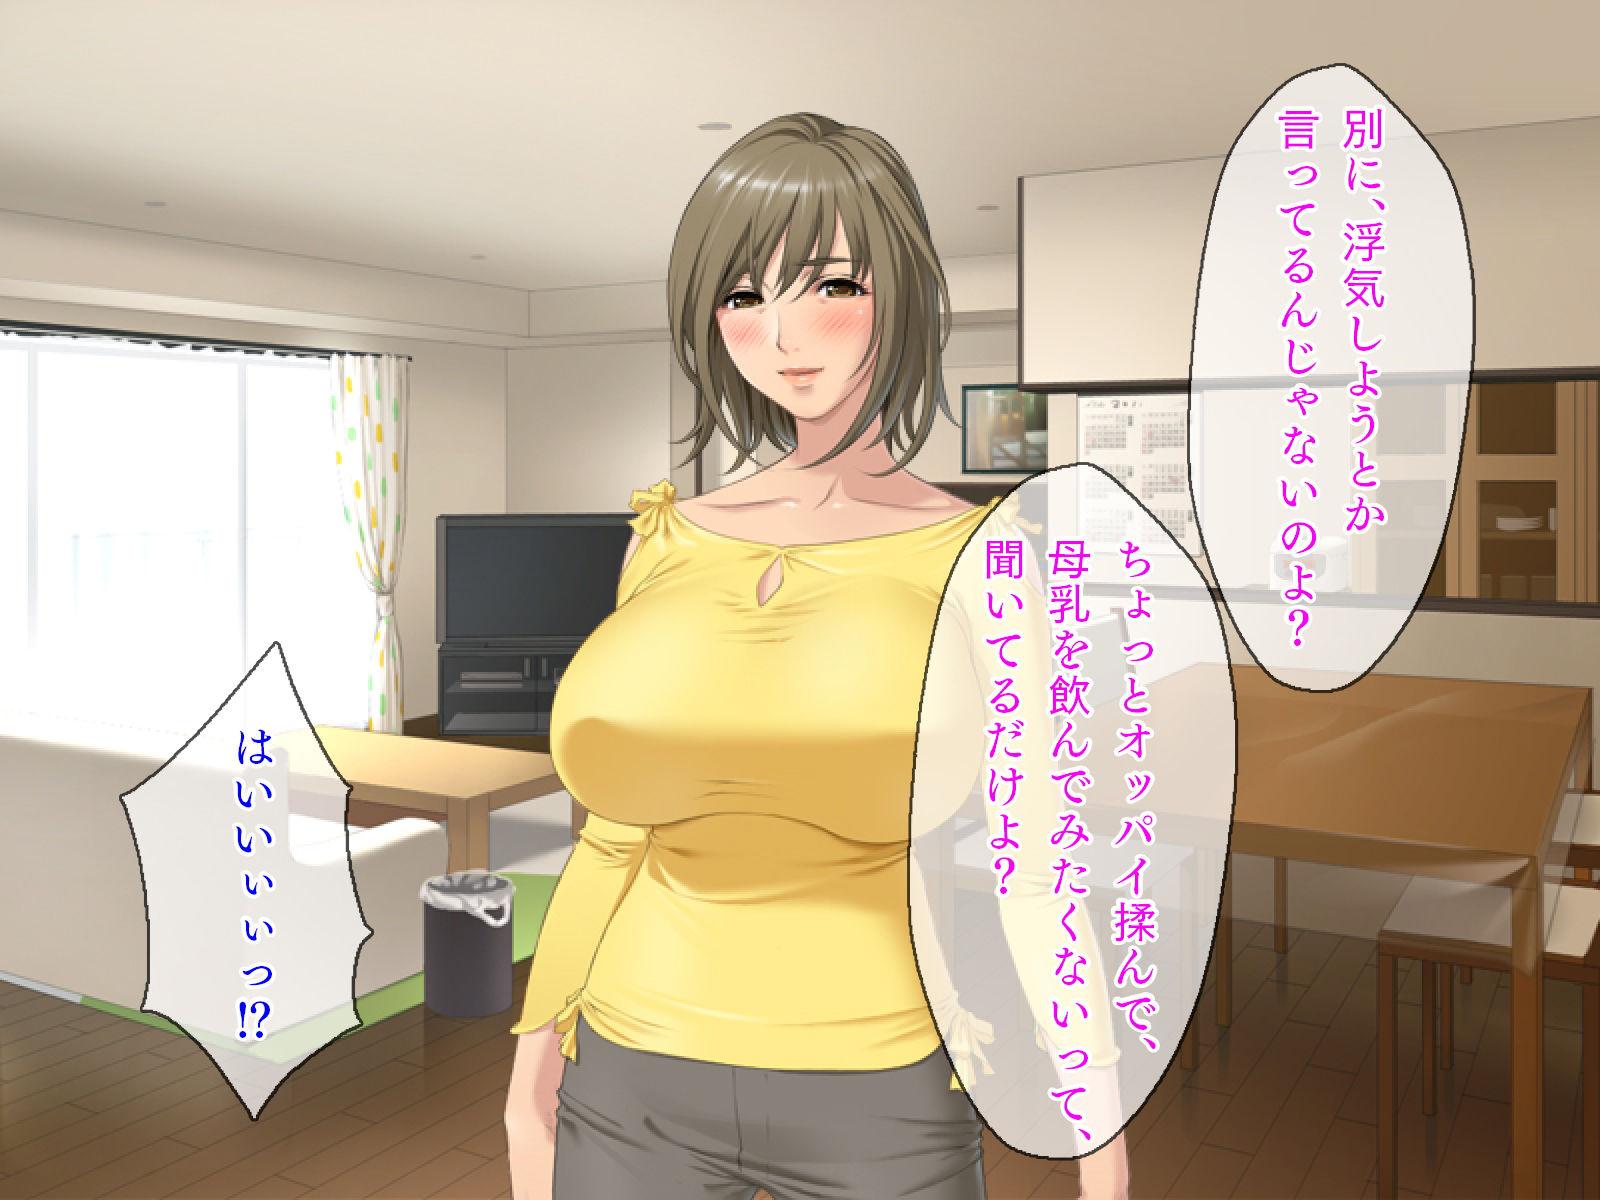 【TGA 同人】美巨乳マドンナ~年下好き女教師と緊縛和服美人と母乳たっぷり人妻~